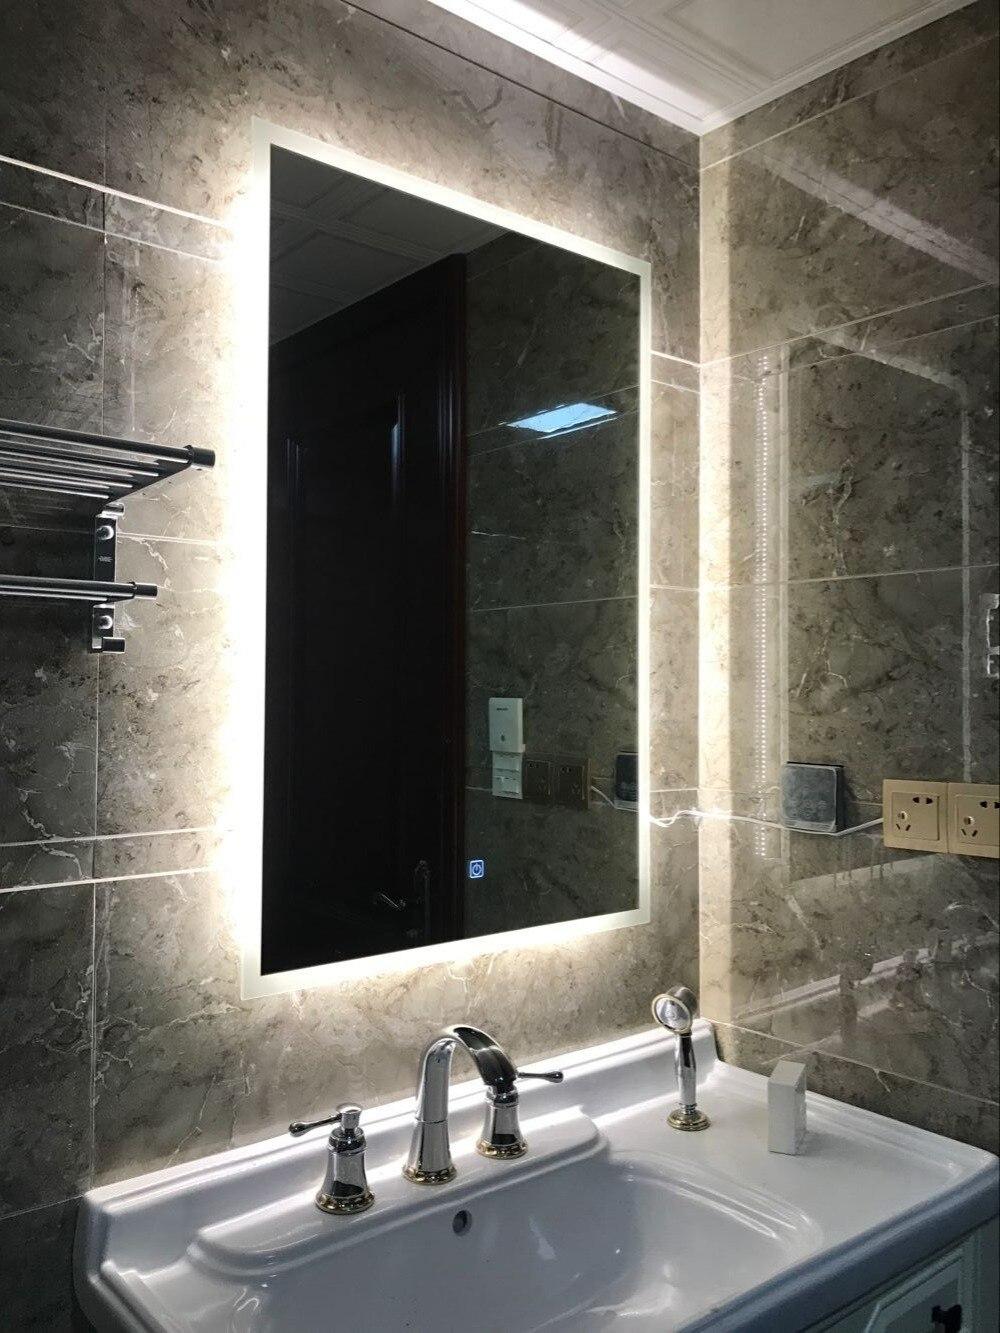 Bathroom mirror with backlight - Led Backlit Mirror